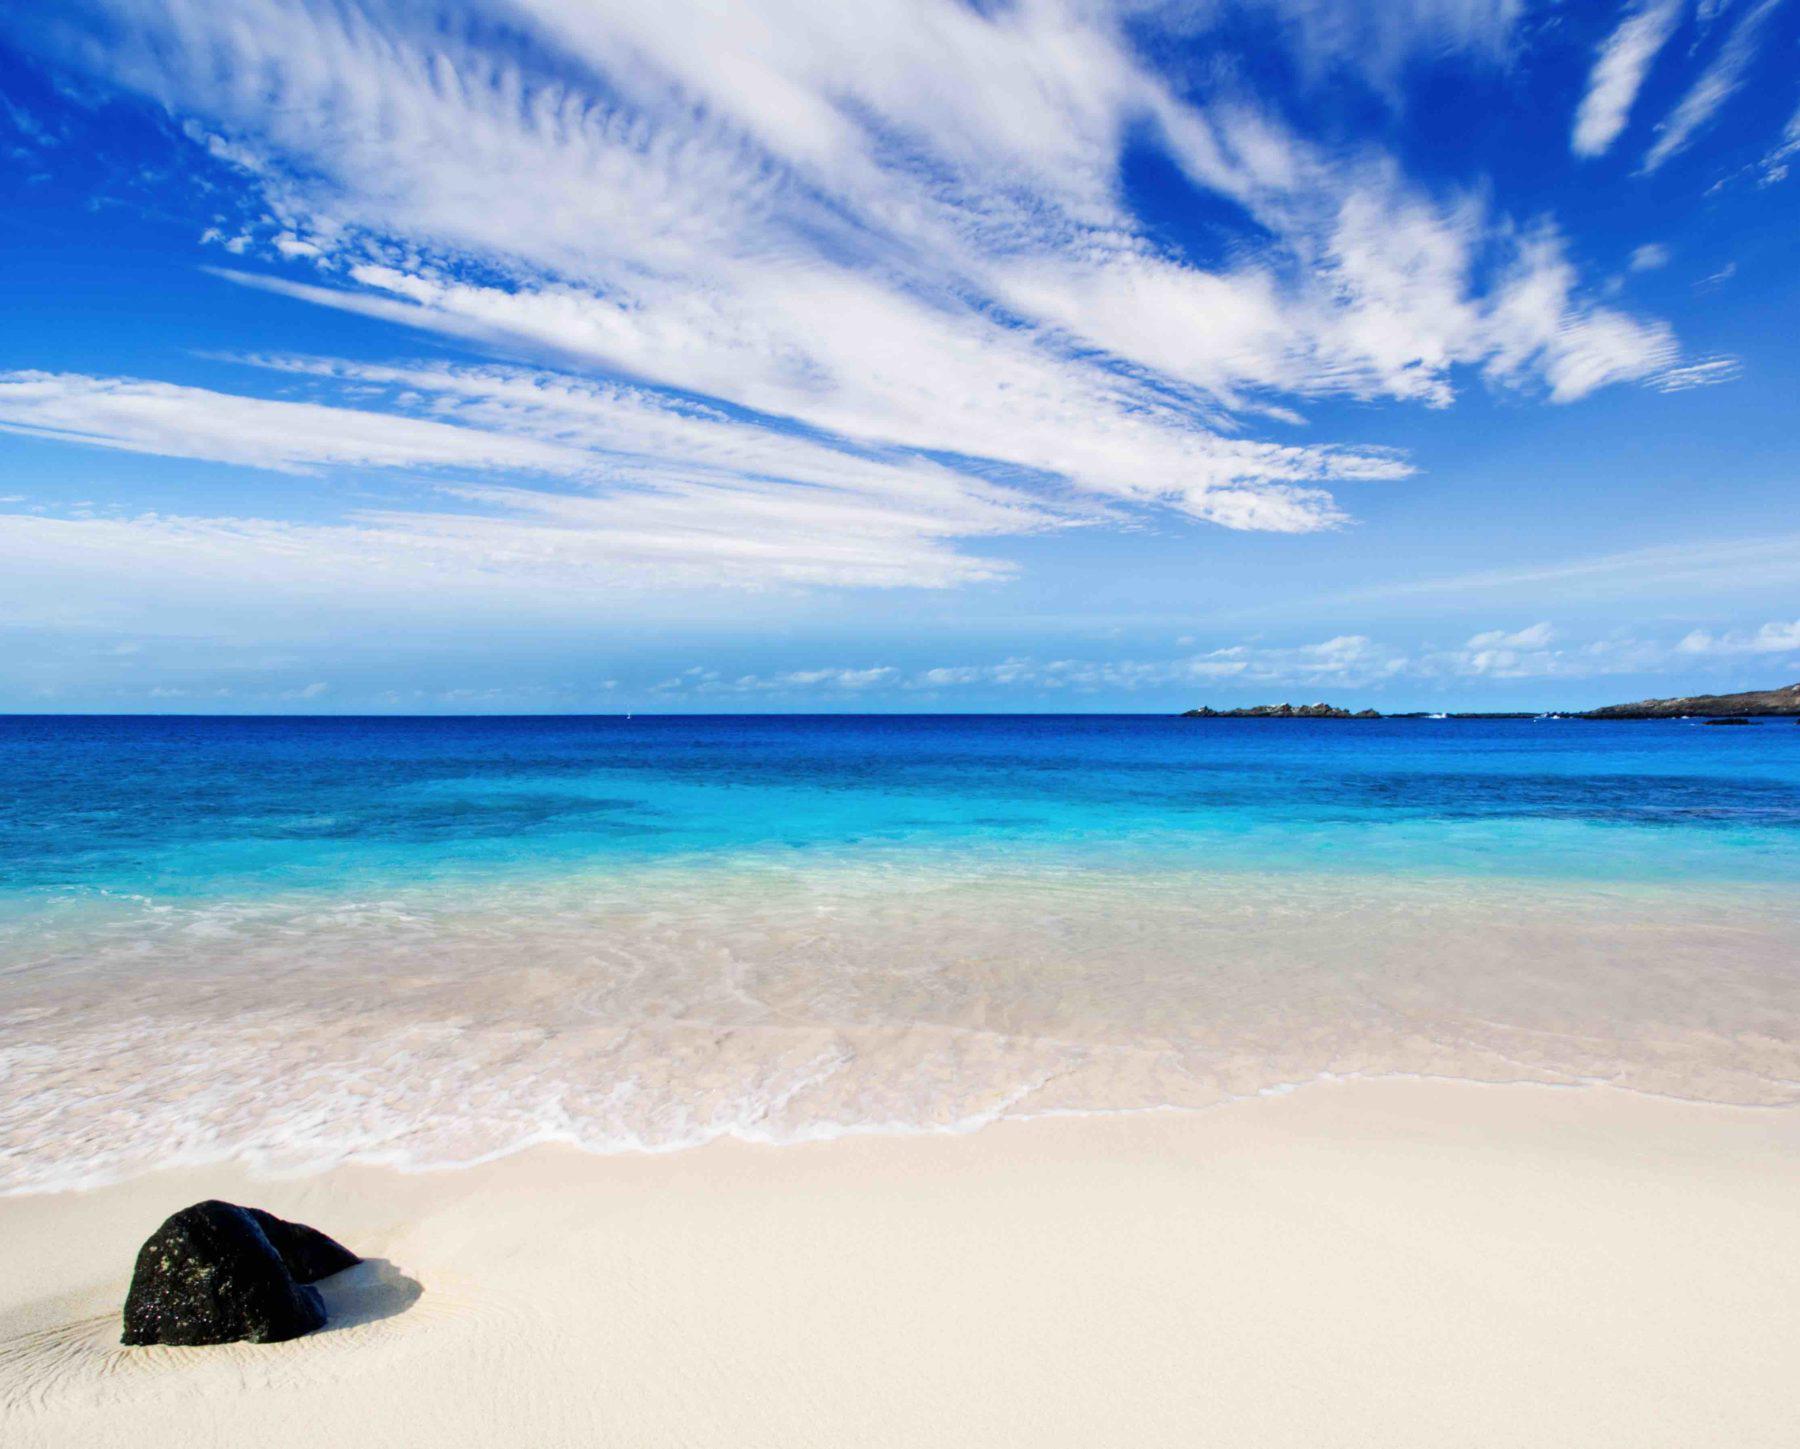 Gulf Winds Resort image 0